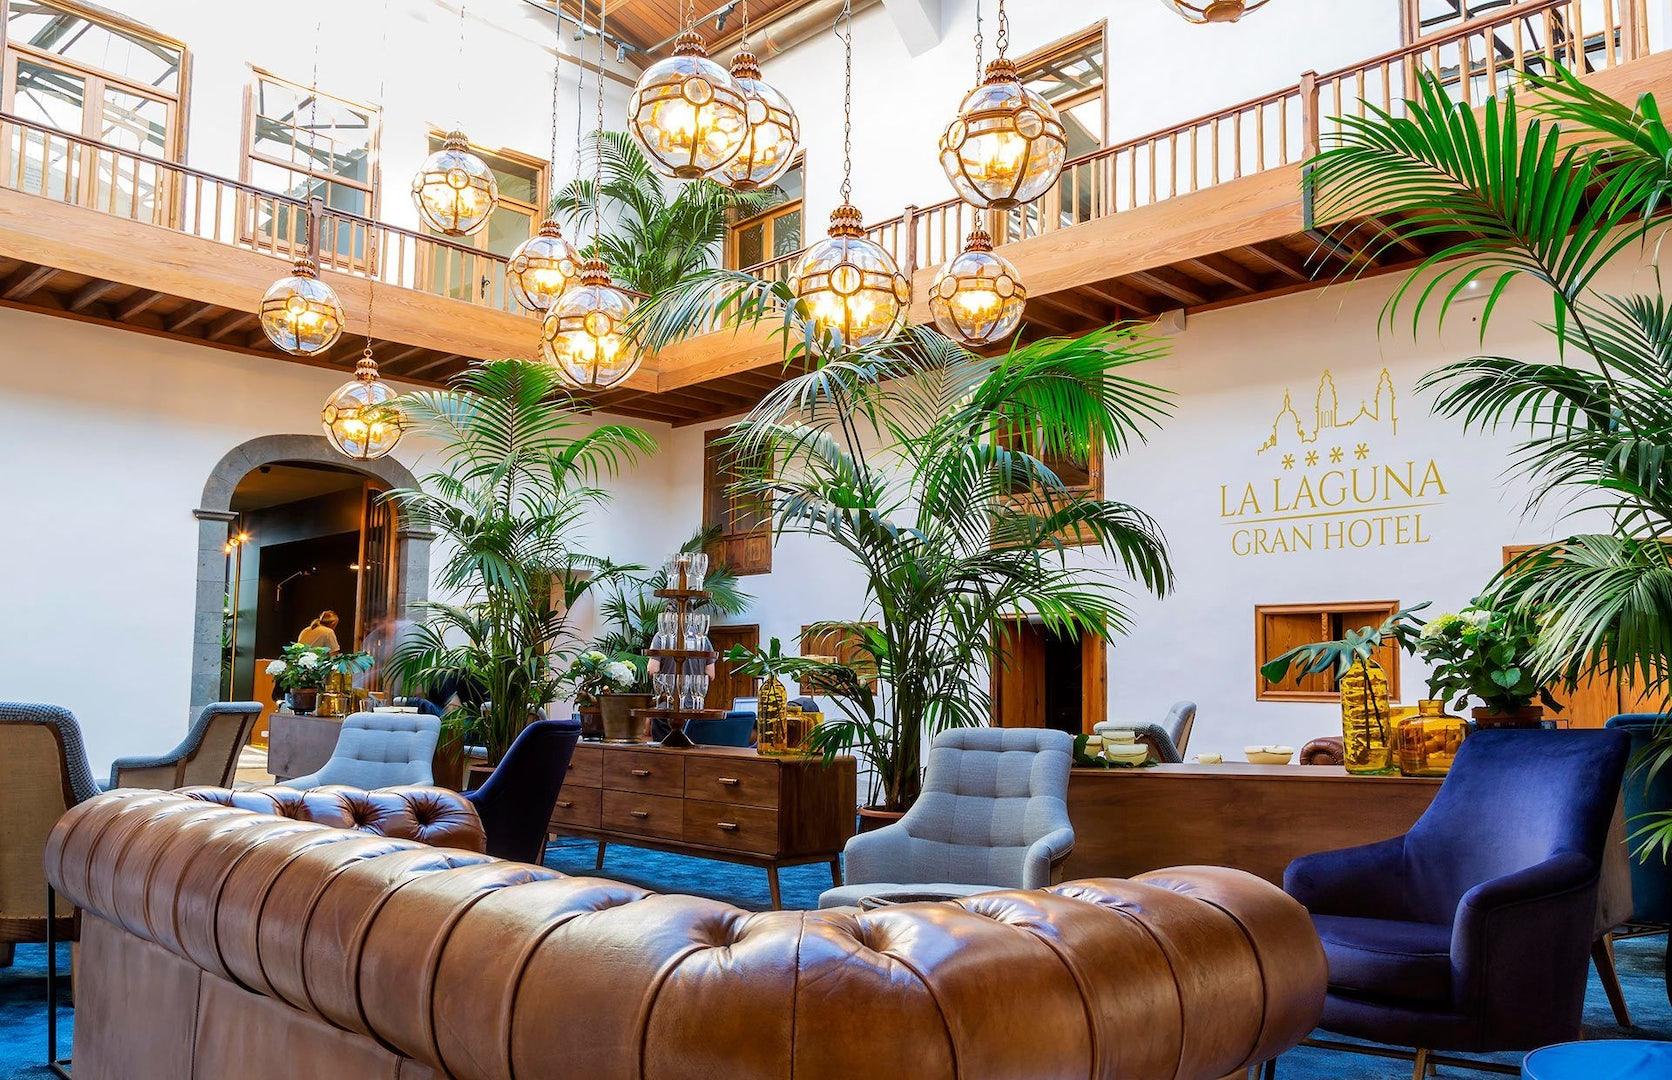 lobby of La Laguna Gran Hotel